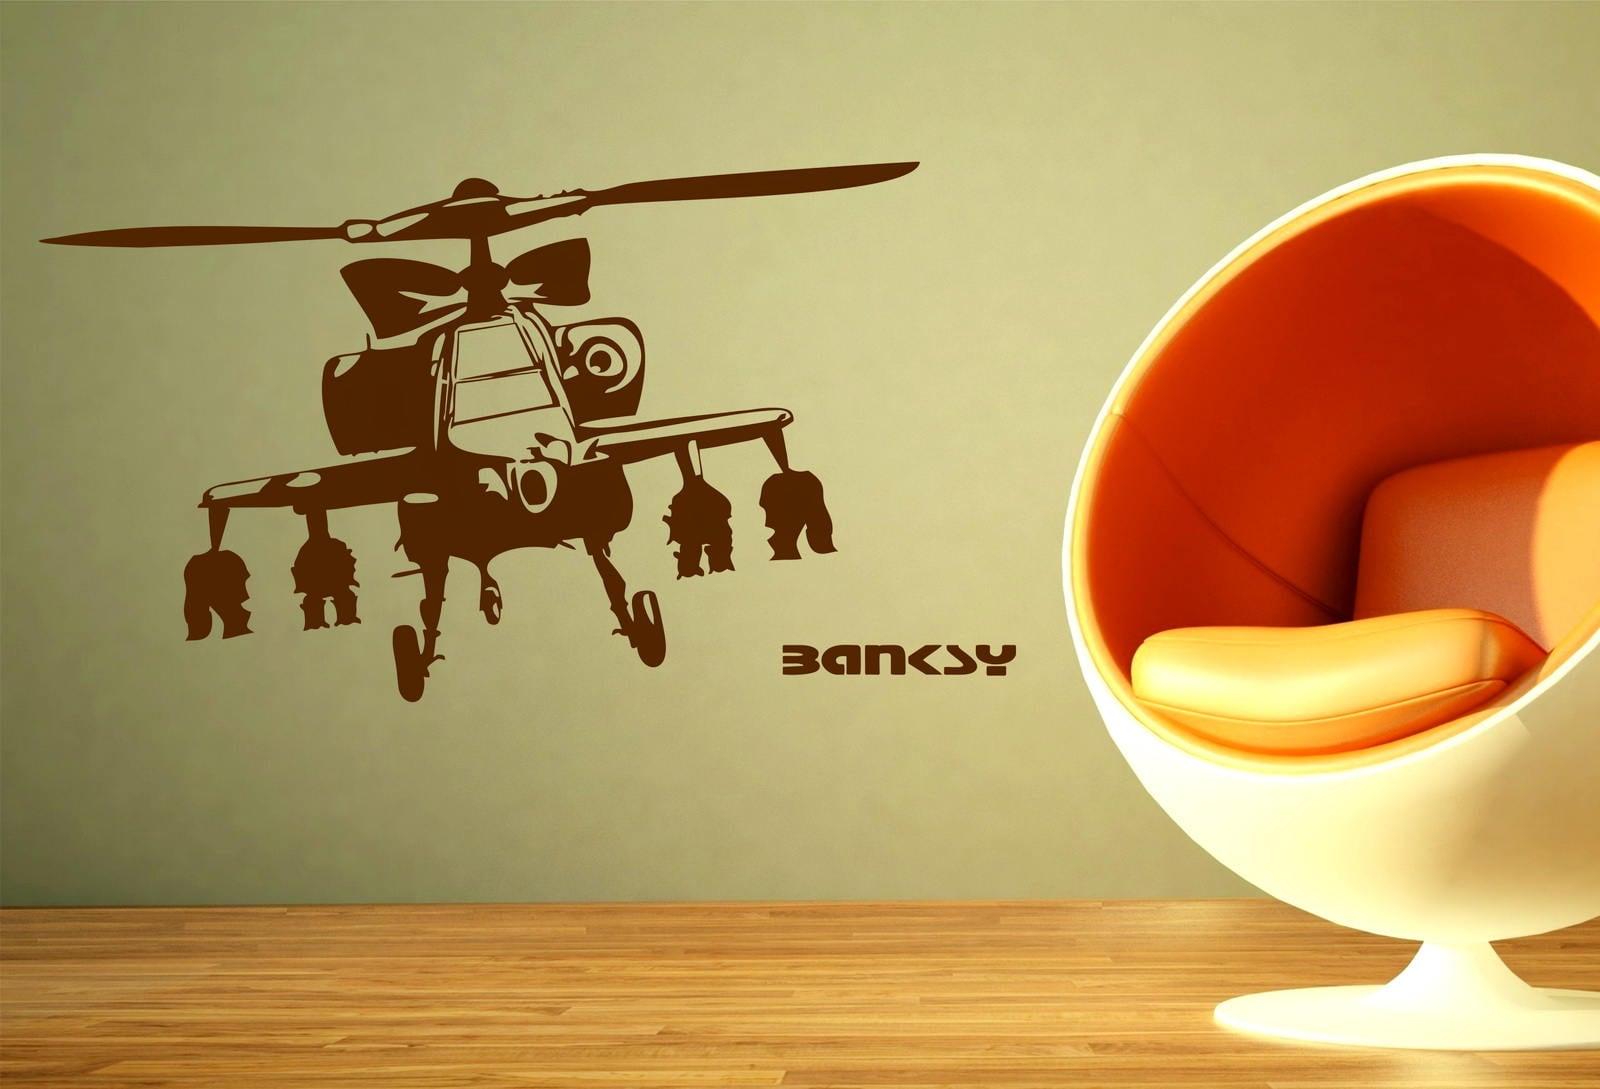 Banksy Apache Helicopter Decor Vinyl Wall Sticker Decal Graffiti Art ...